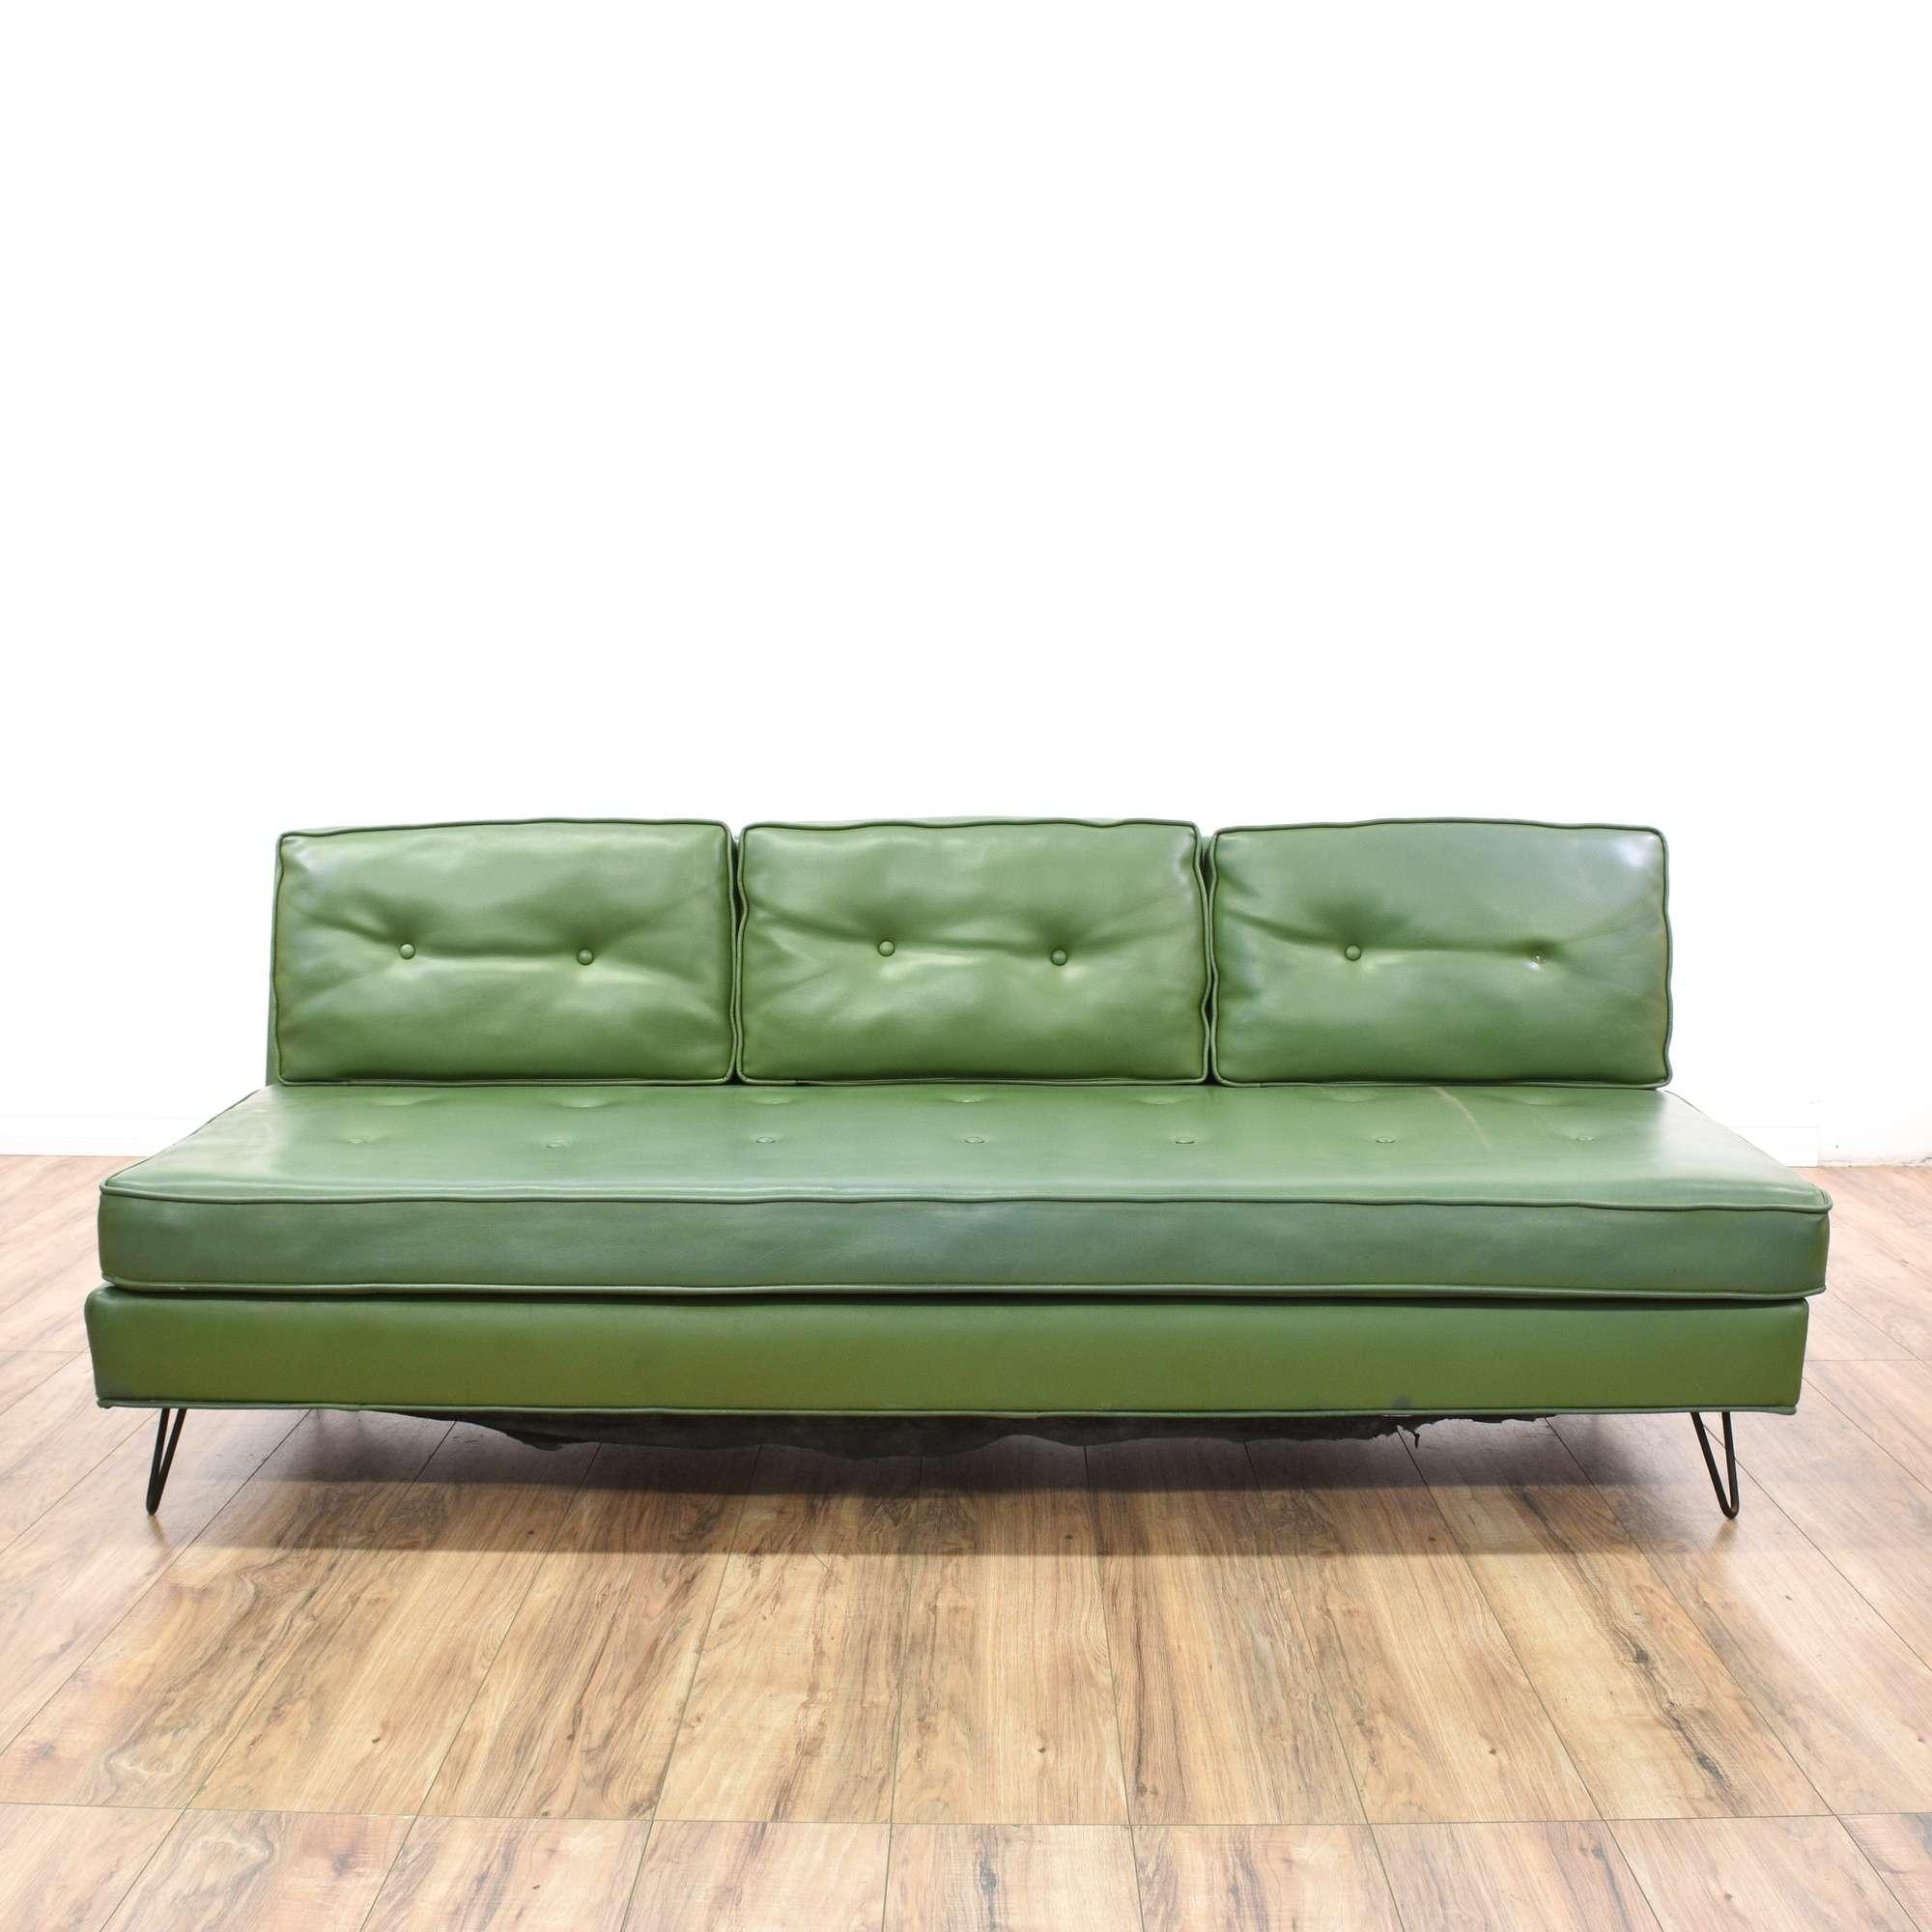 Mid Century Modern Green Vinyl Sofa | Loveseat Vintage Furniture San ...